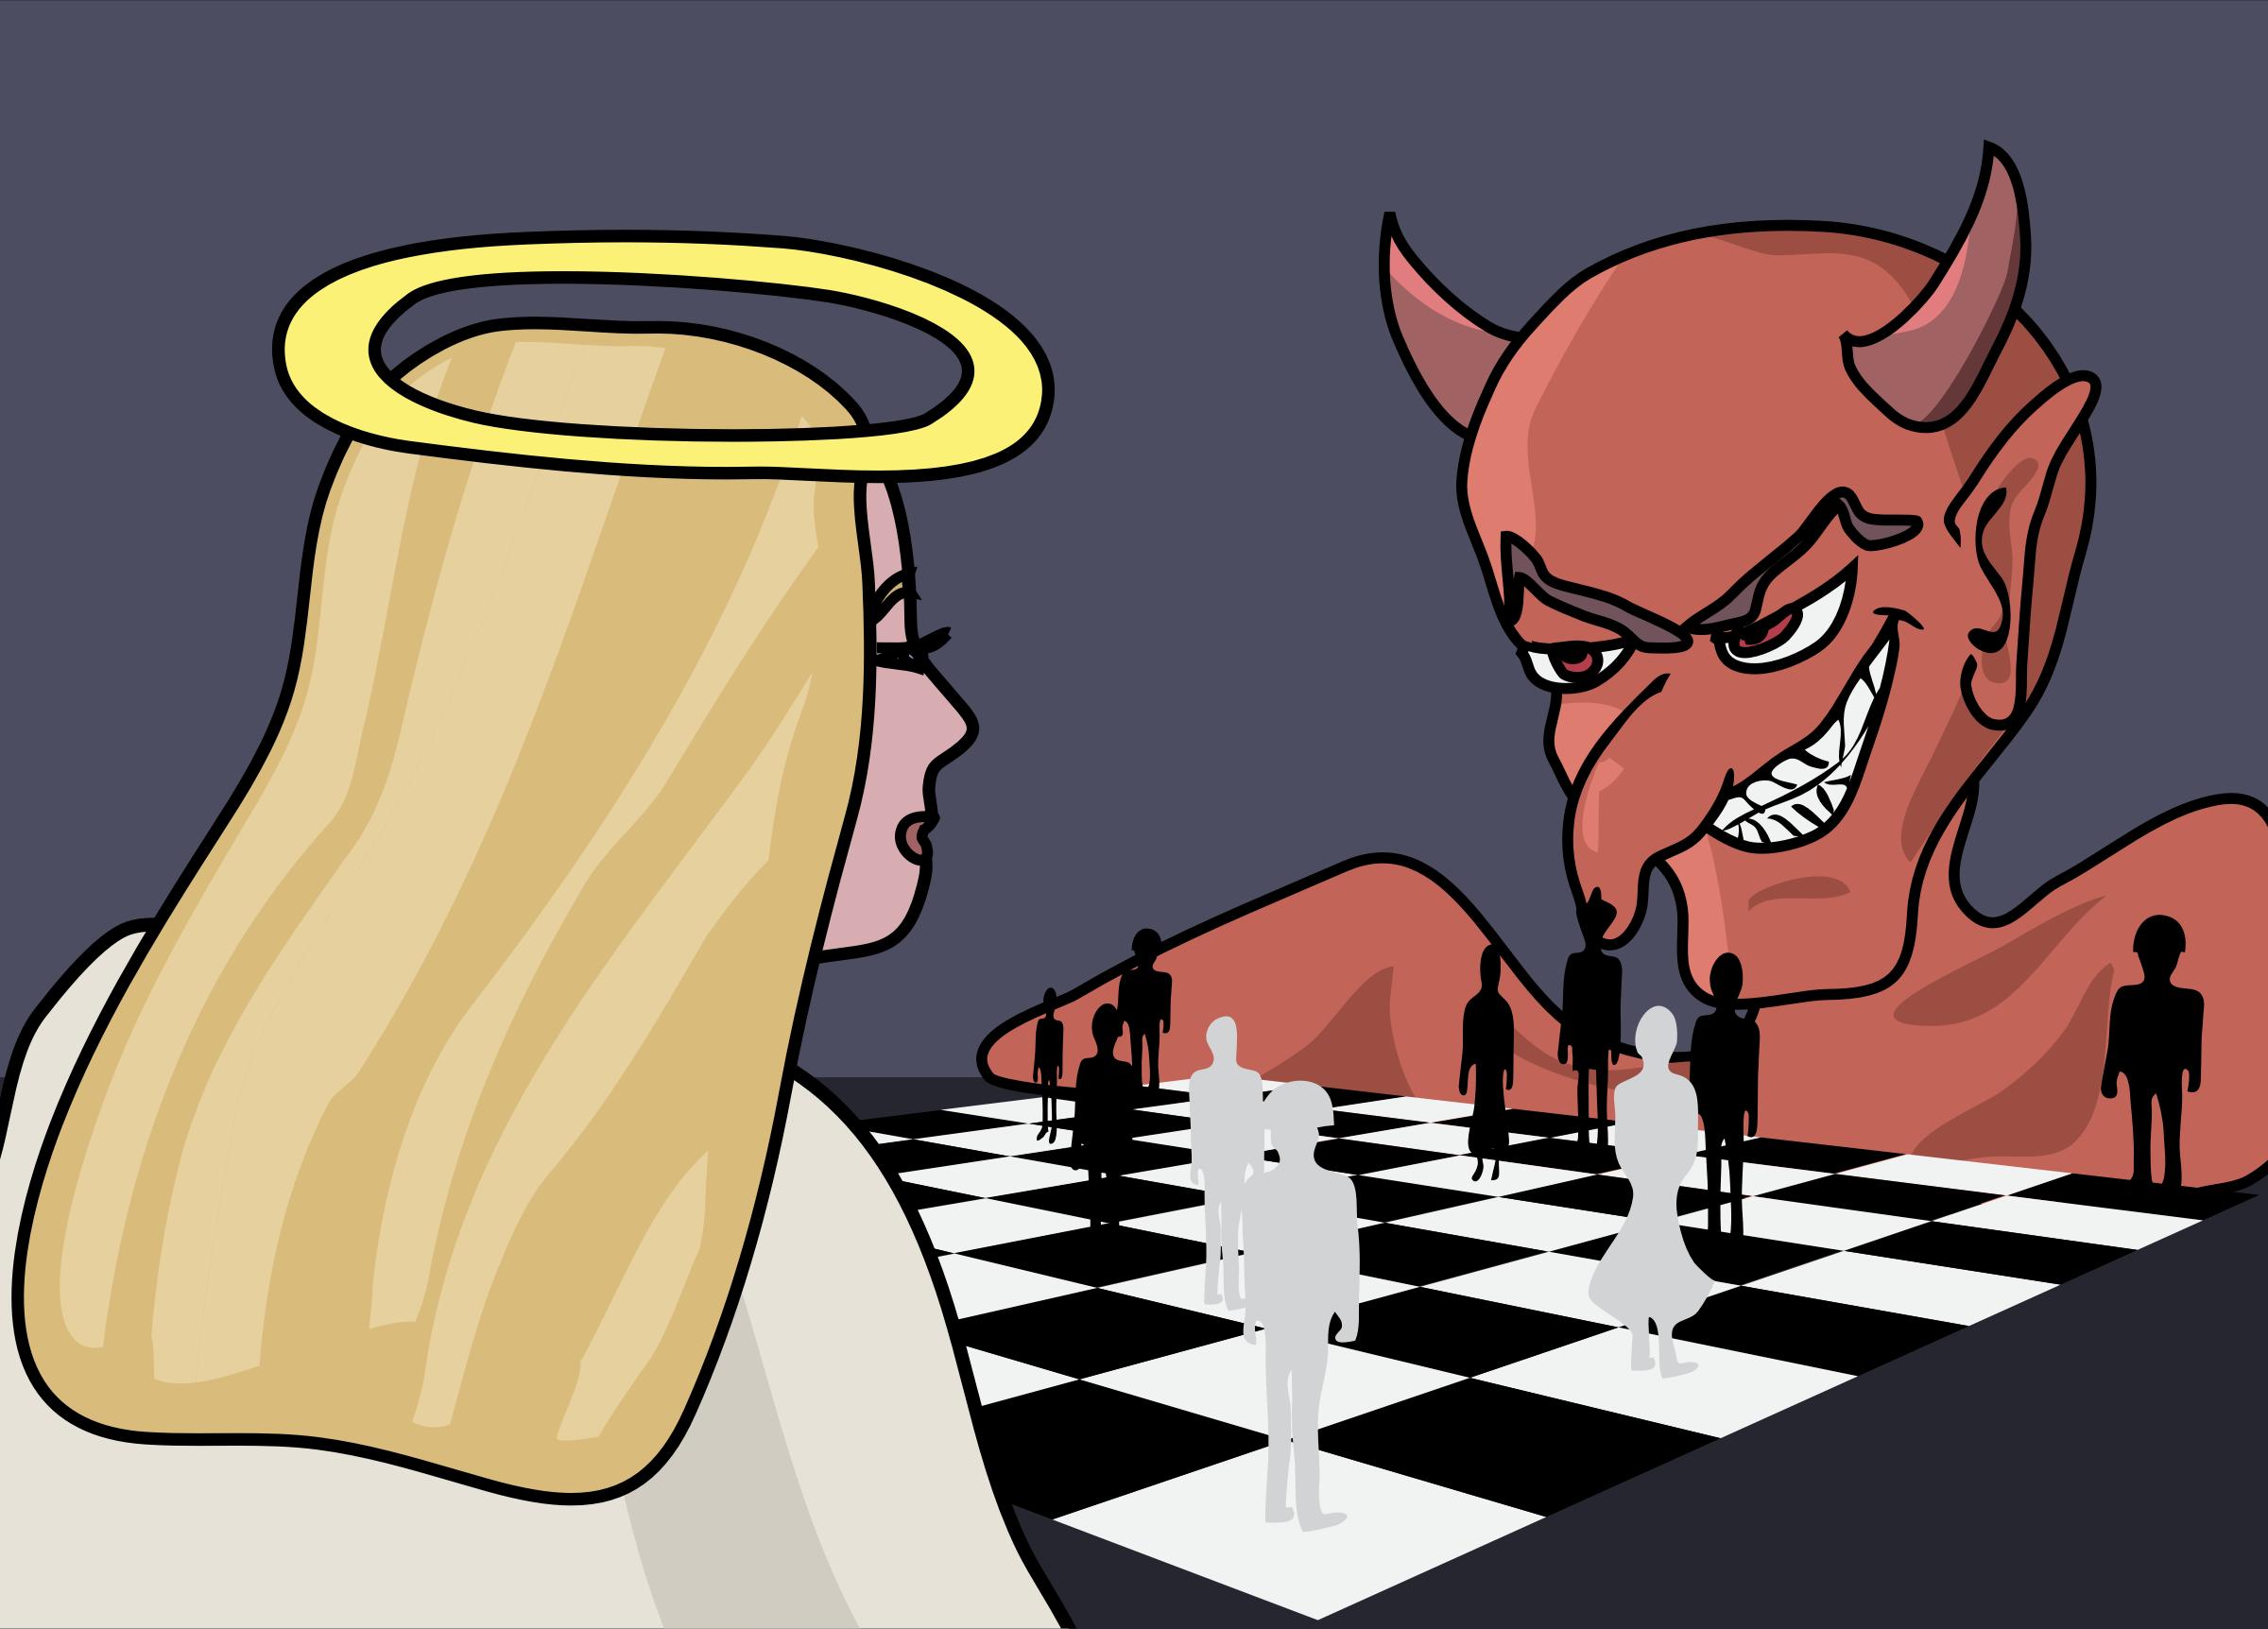 Angels vs demons clipart.